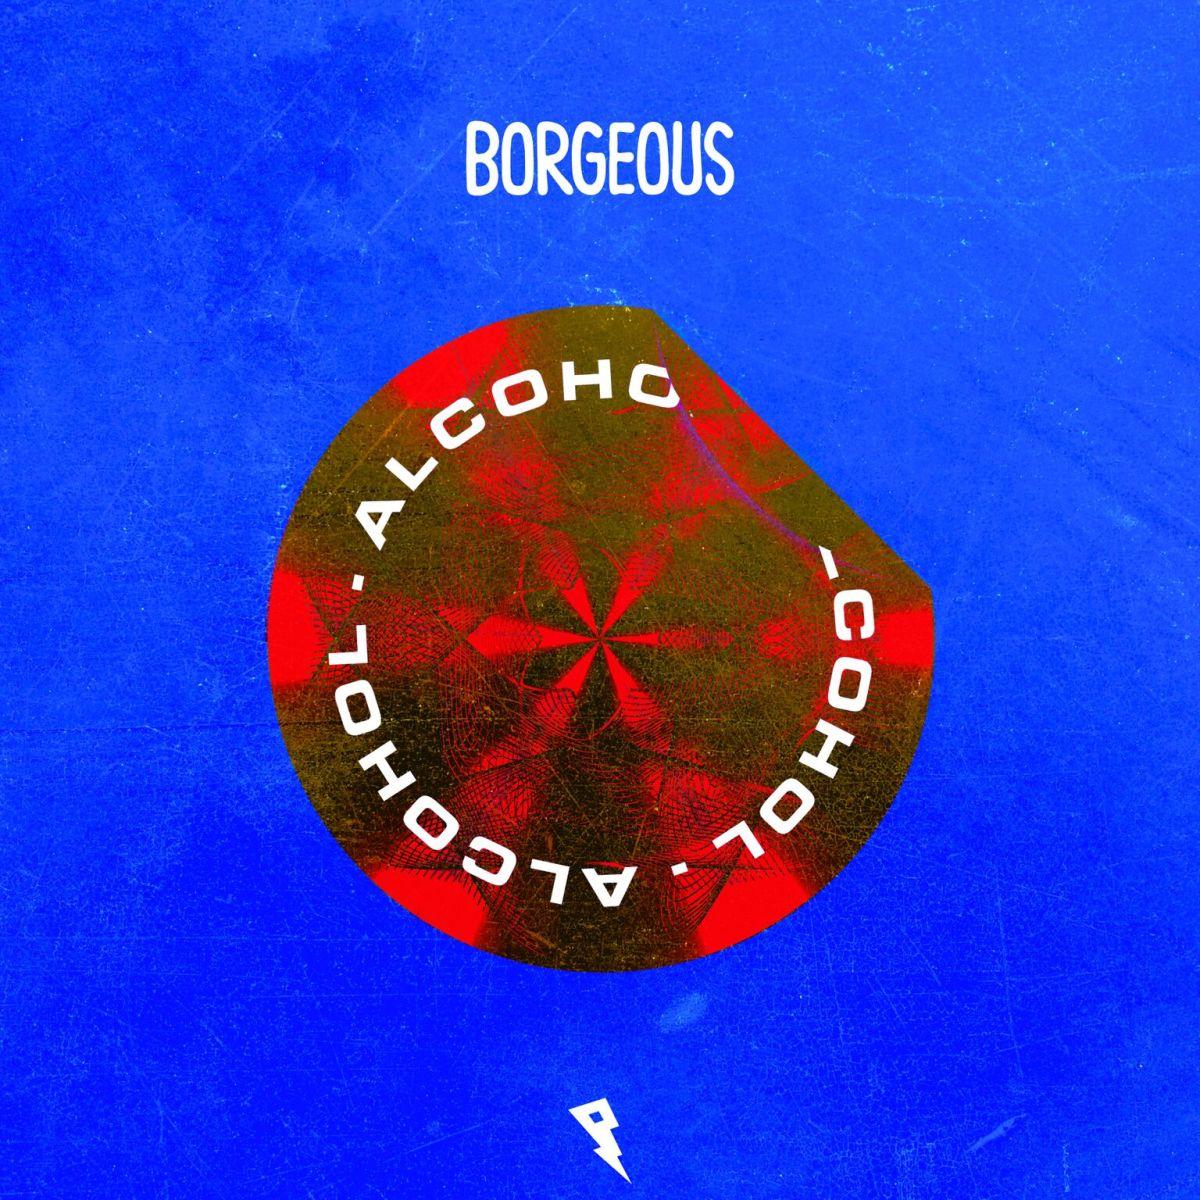 Borgeous Alcohol Album Art